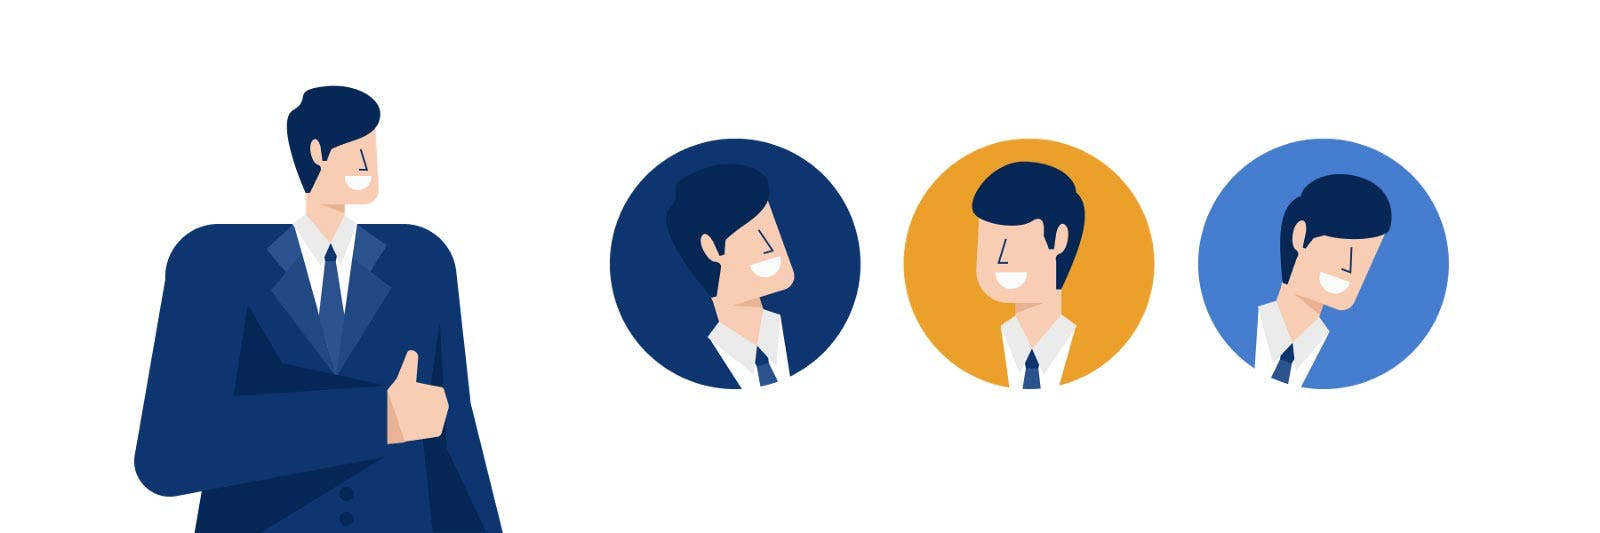 Illustration of multiple avatar faces